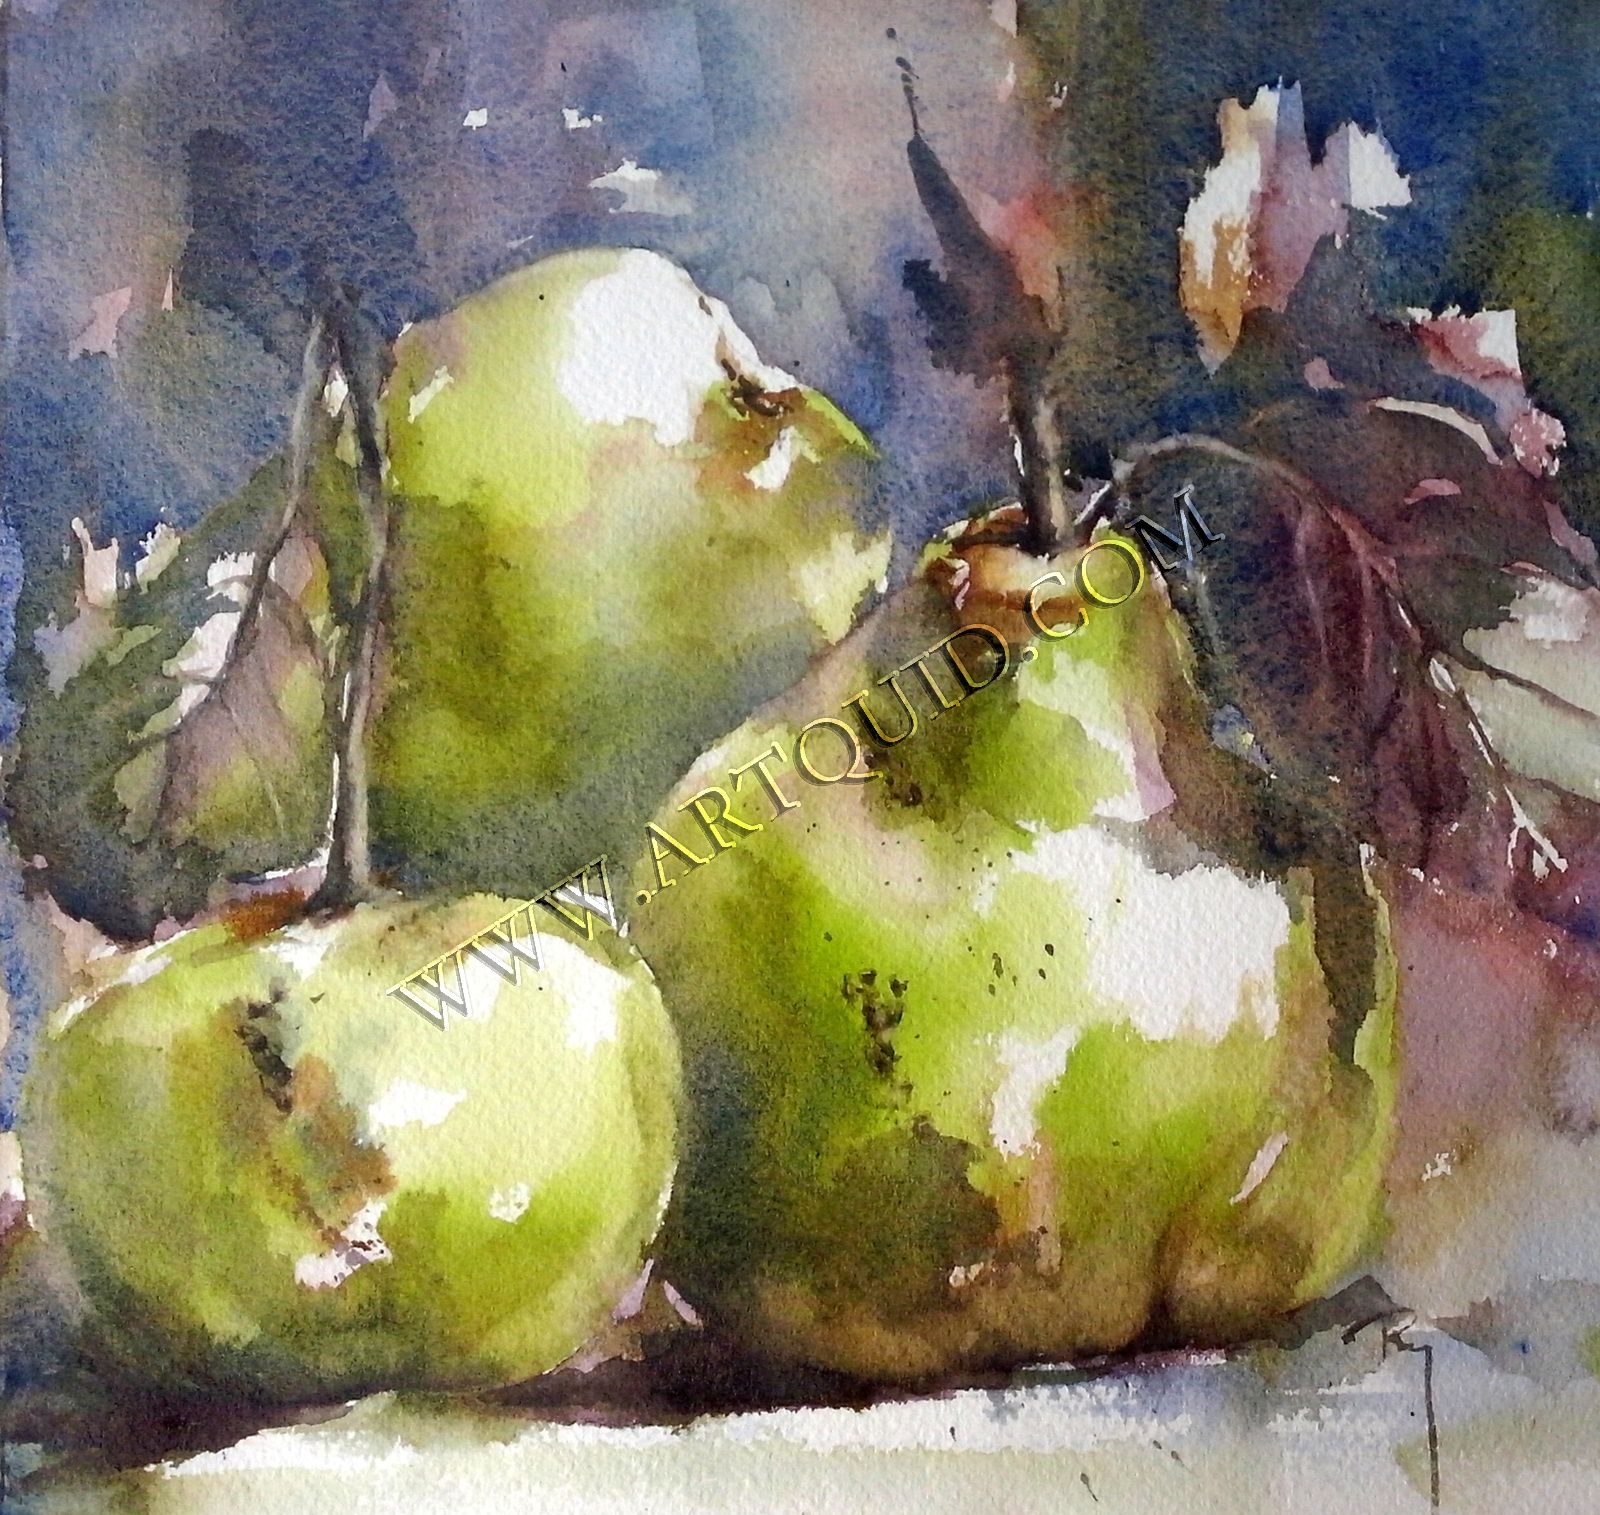 Memories Peinture De Nature Morte Dessin Fruits Fruits Aquarelle